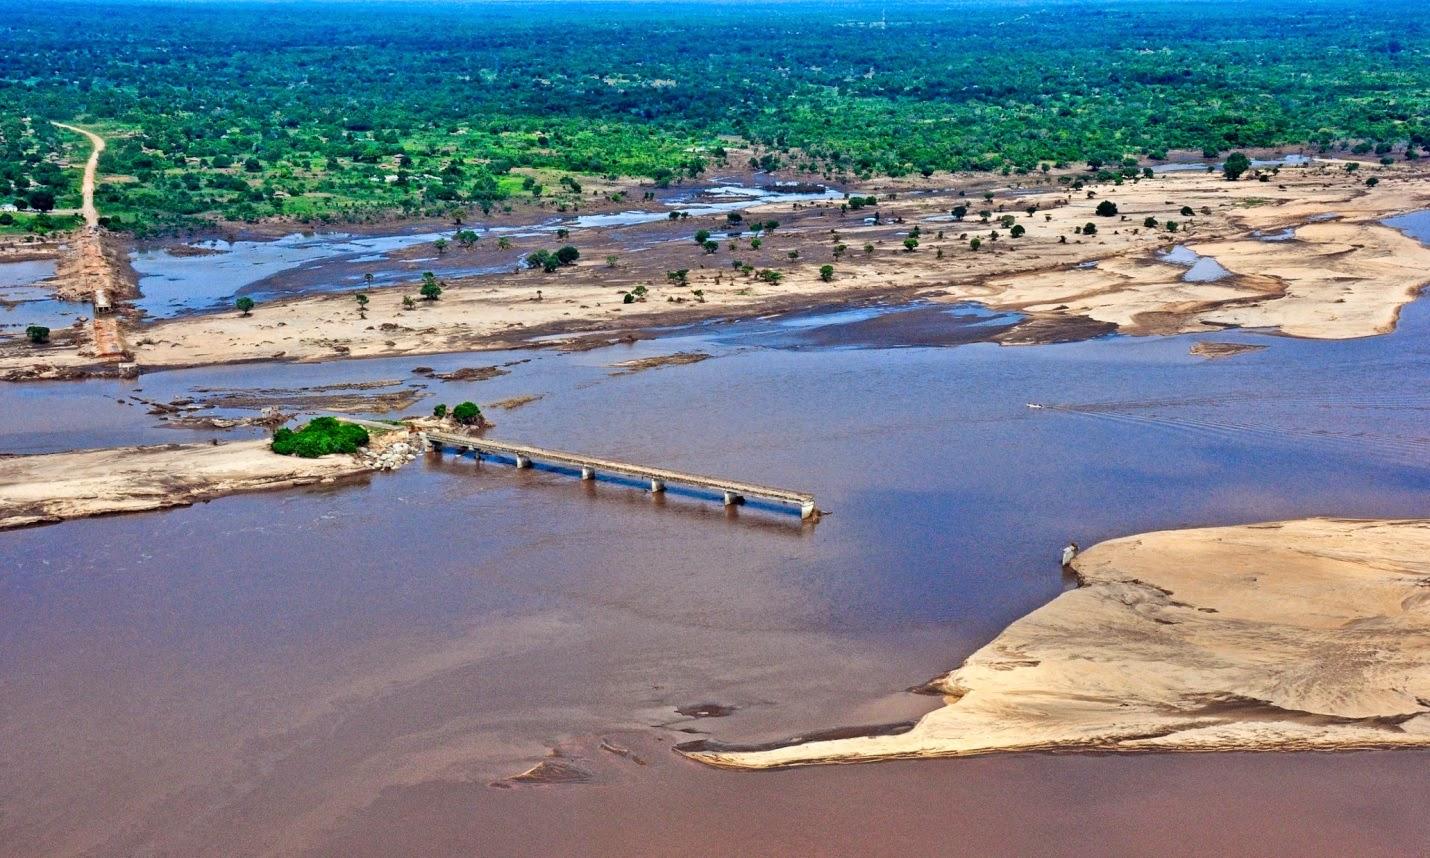 A broken bridge over the Licungo river after flooding in Zambezia province, Mozambique. (Credit: Antonio Silva/EPA) Click to Enlarge.